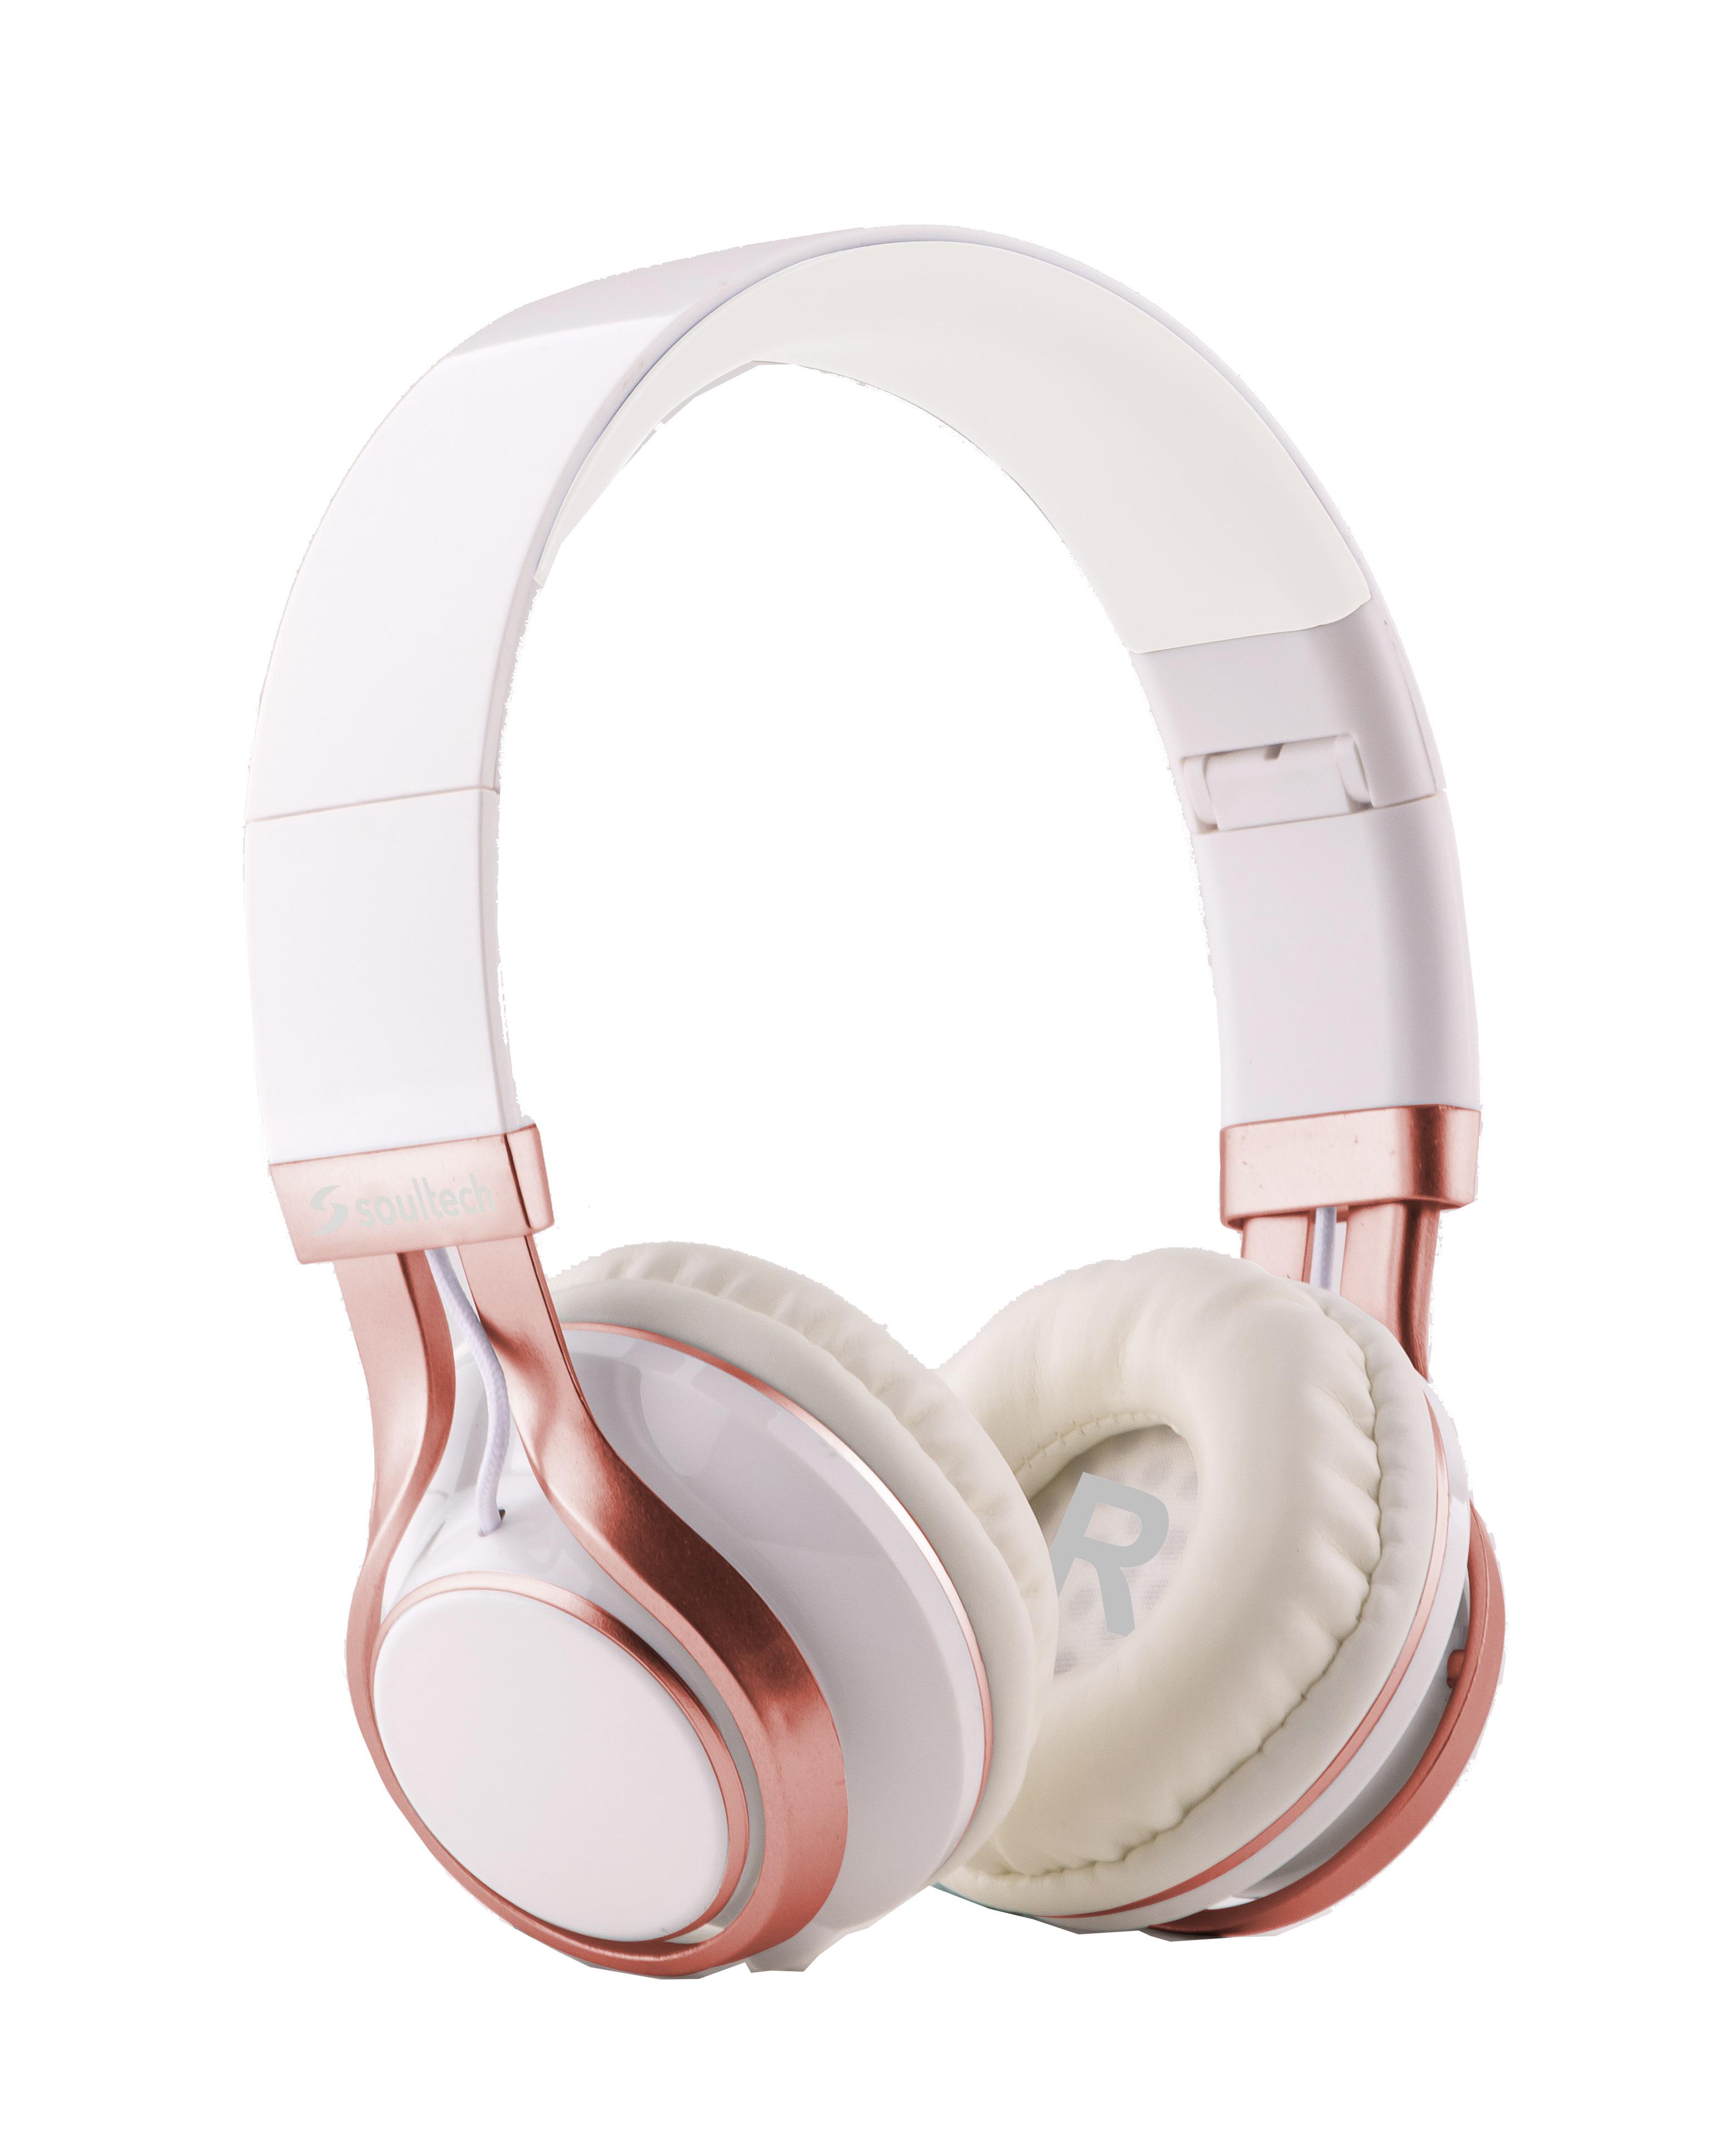 Soultech Soulbass (Mikrofonlu) Beyaz-Rosegold Solo Kulaklık SK203BR  Rose Gold